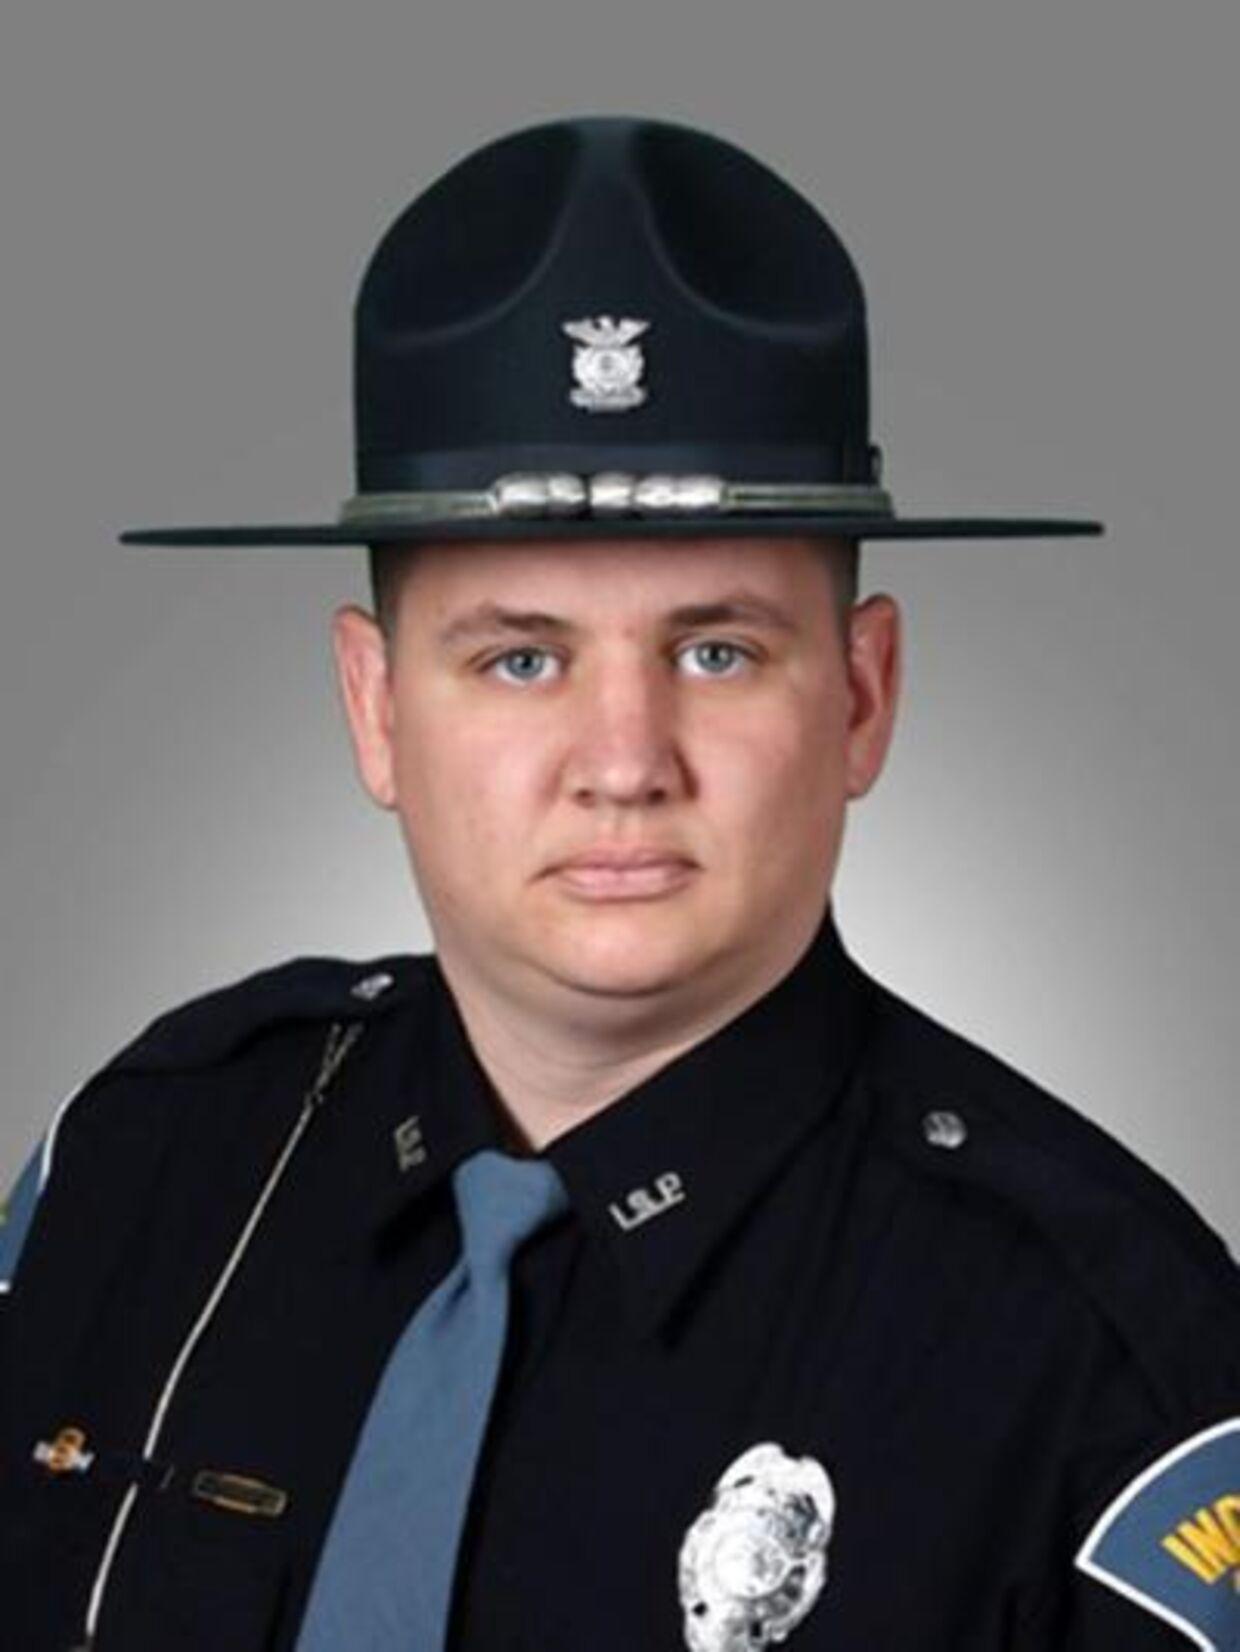 Her ses betjenten Scott Jarvis